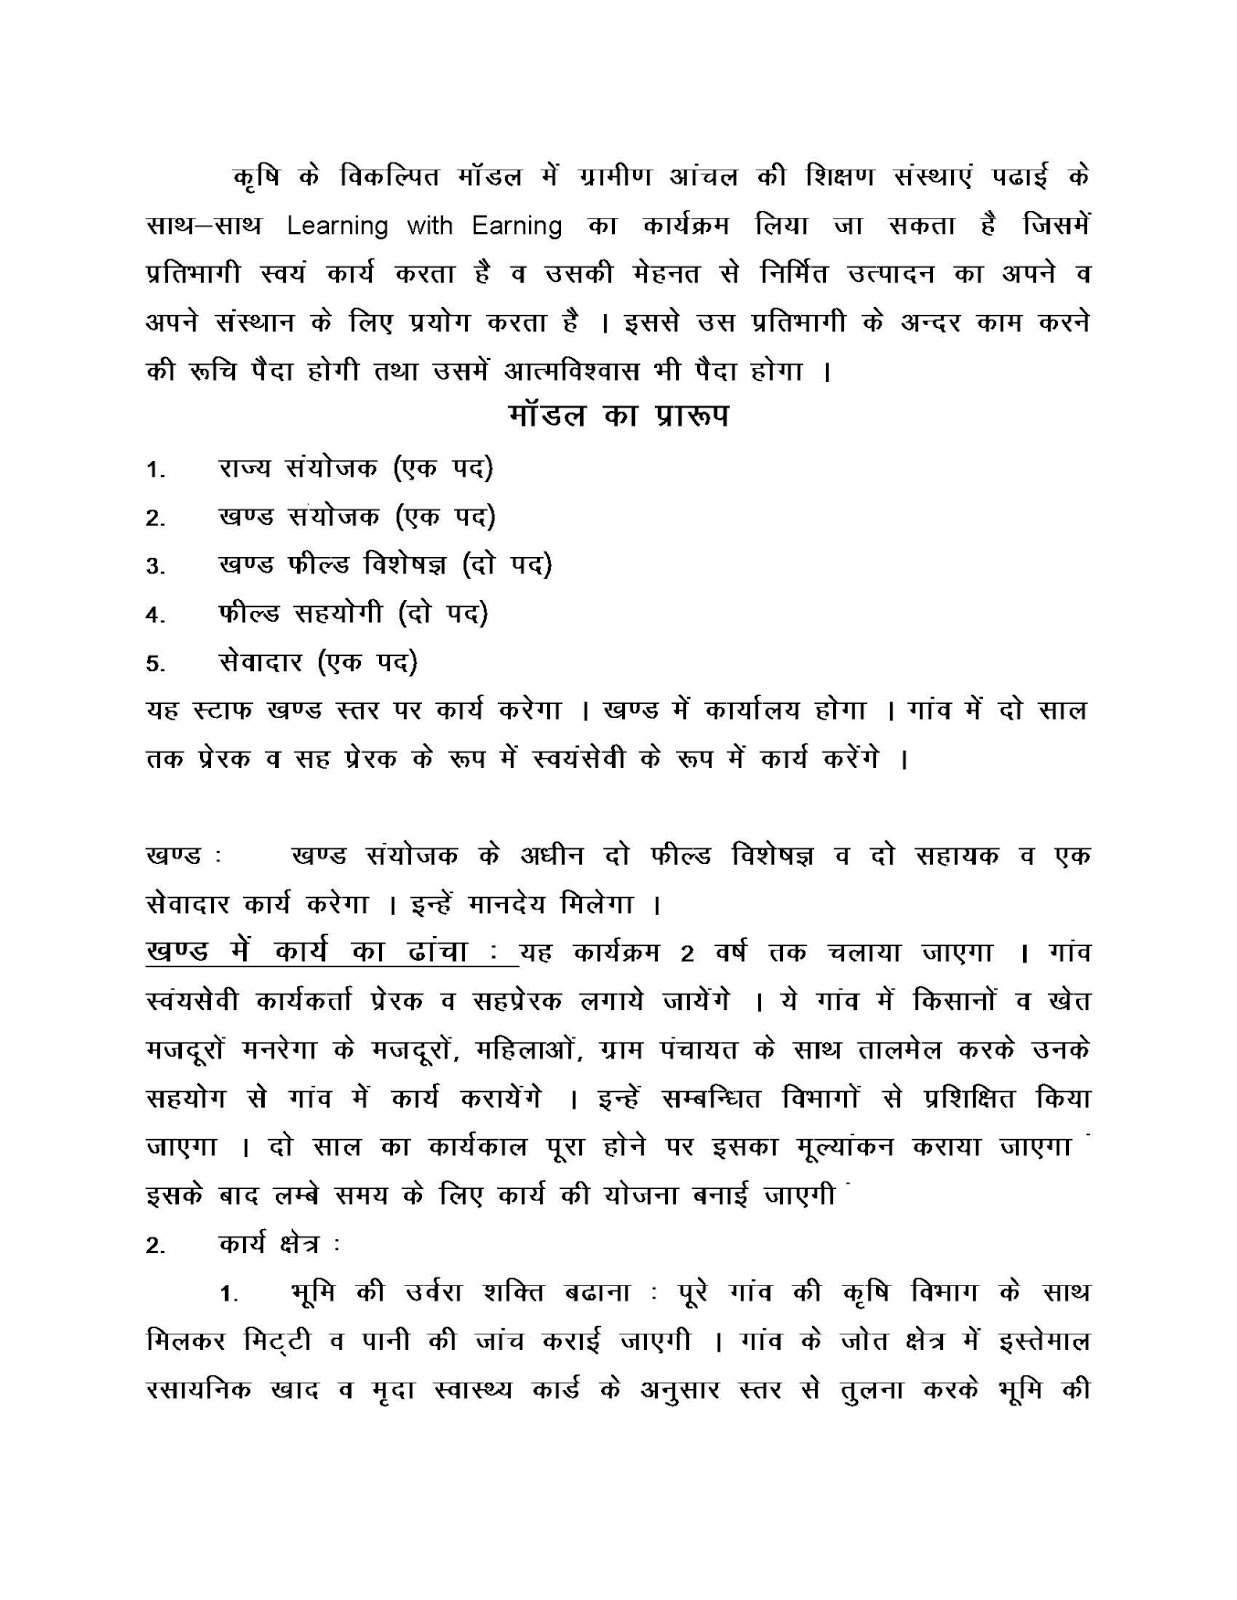 002 Hindi252bwork252bdr 252brajinder252bsingh Page 8 Lyric Essays Awesome Essay Examples Full